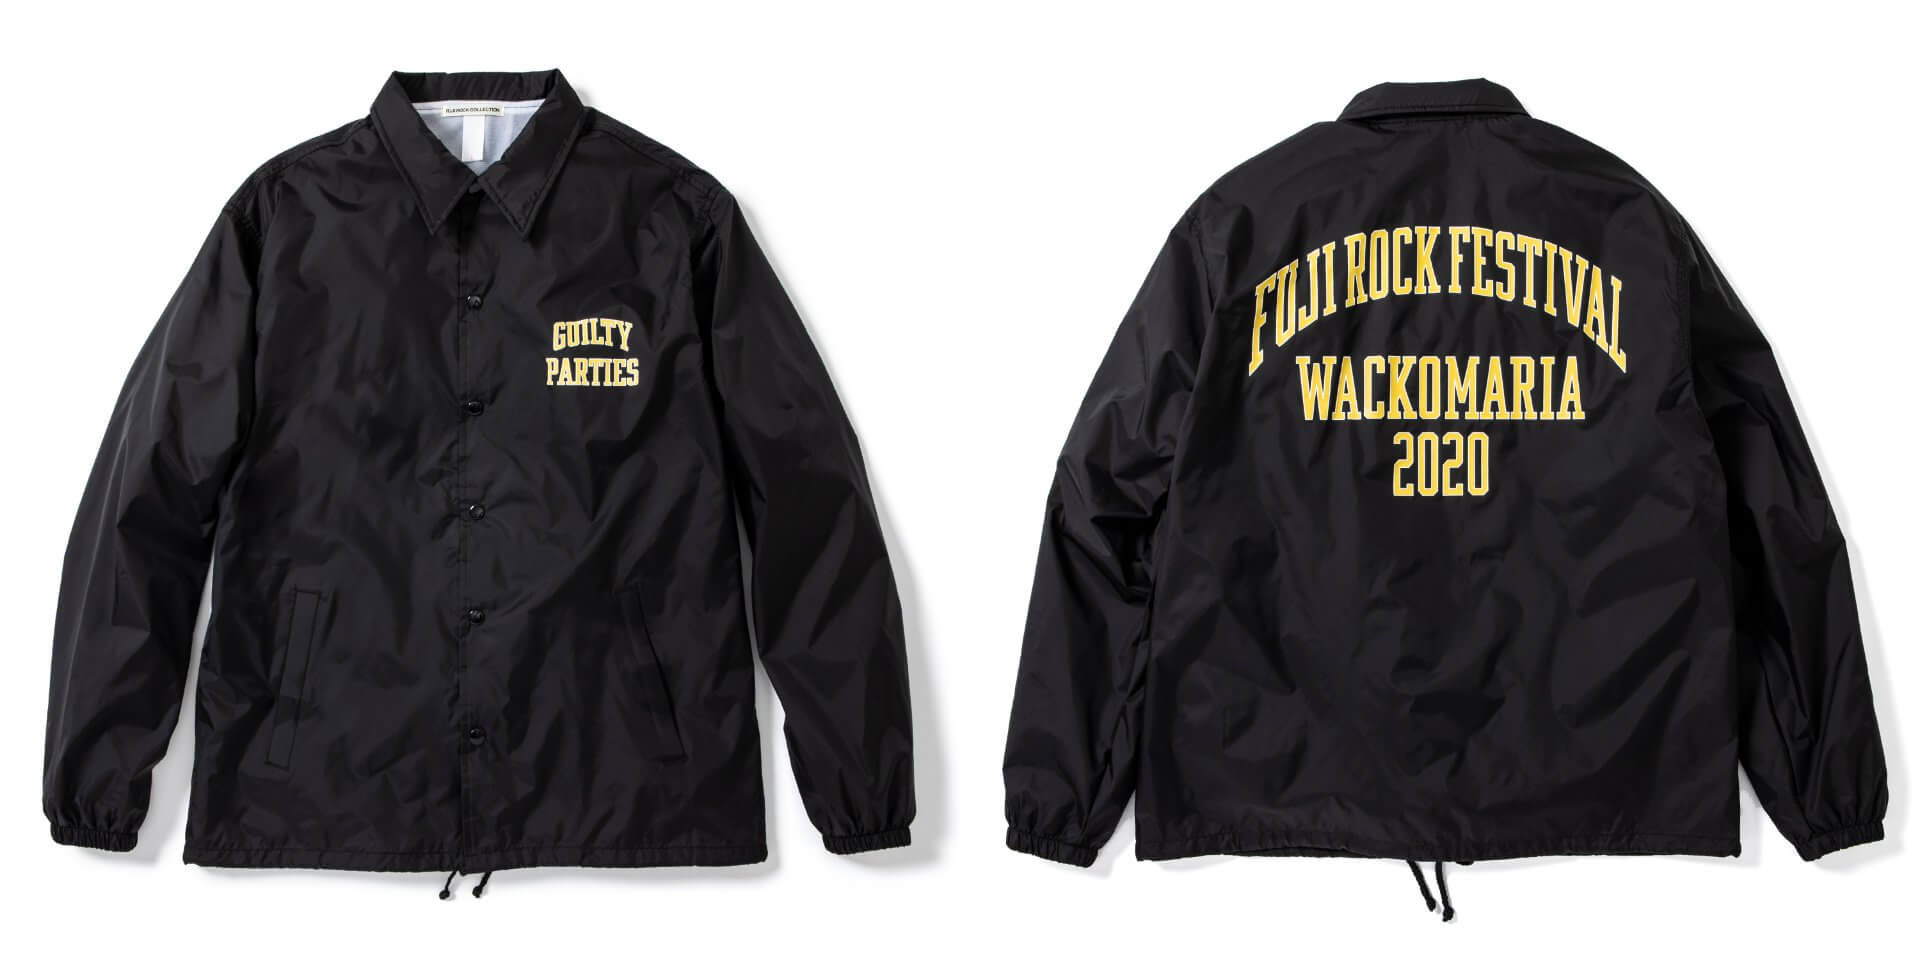 「FUJI ROCK FESTIVAL '20」チケット2次先行販売/オフィシャルツアー第2期受付スタート!新グッズにバックパックなど、新着情報盛りだくさん! music200403-fujirock2020-3-1